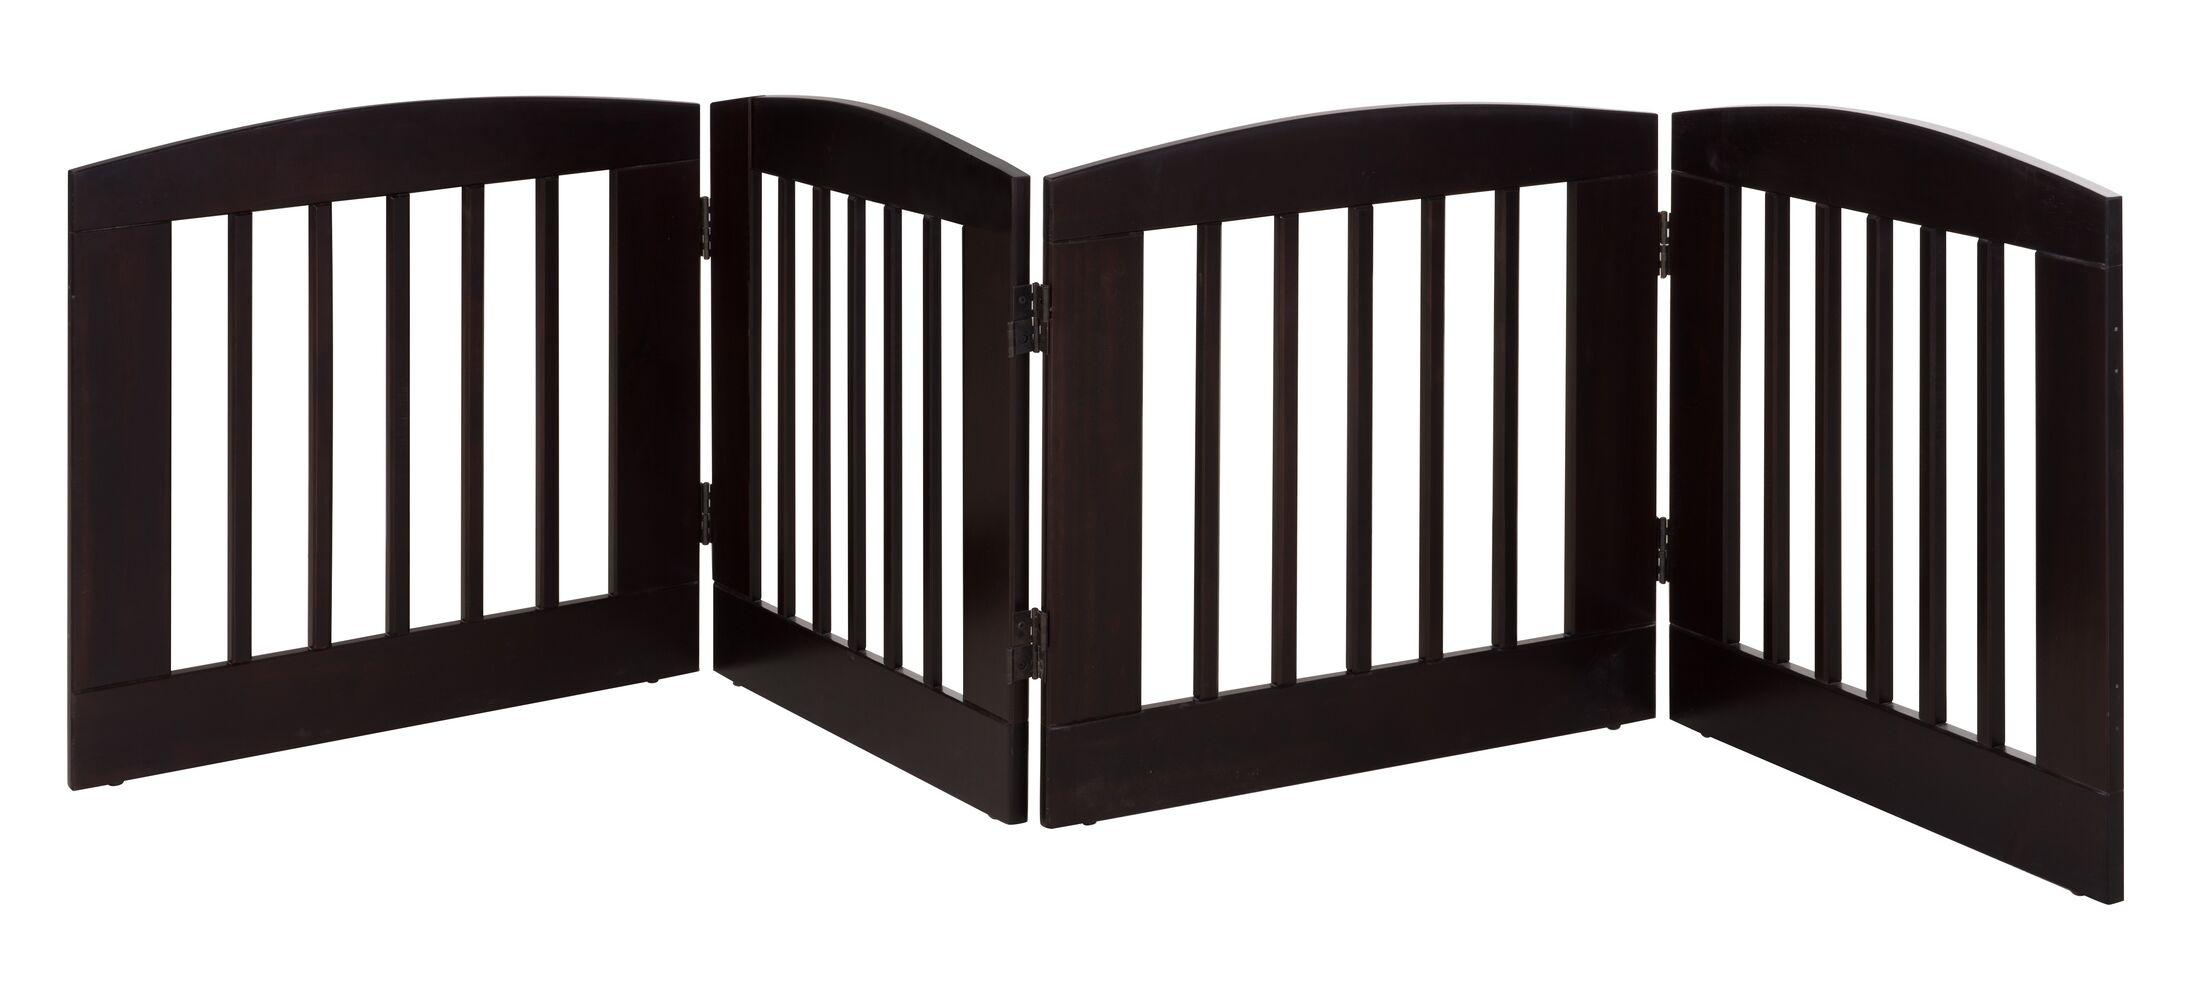 Daniella 4 Panel Expansion Dog Gate Size: Medium (24